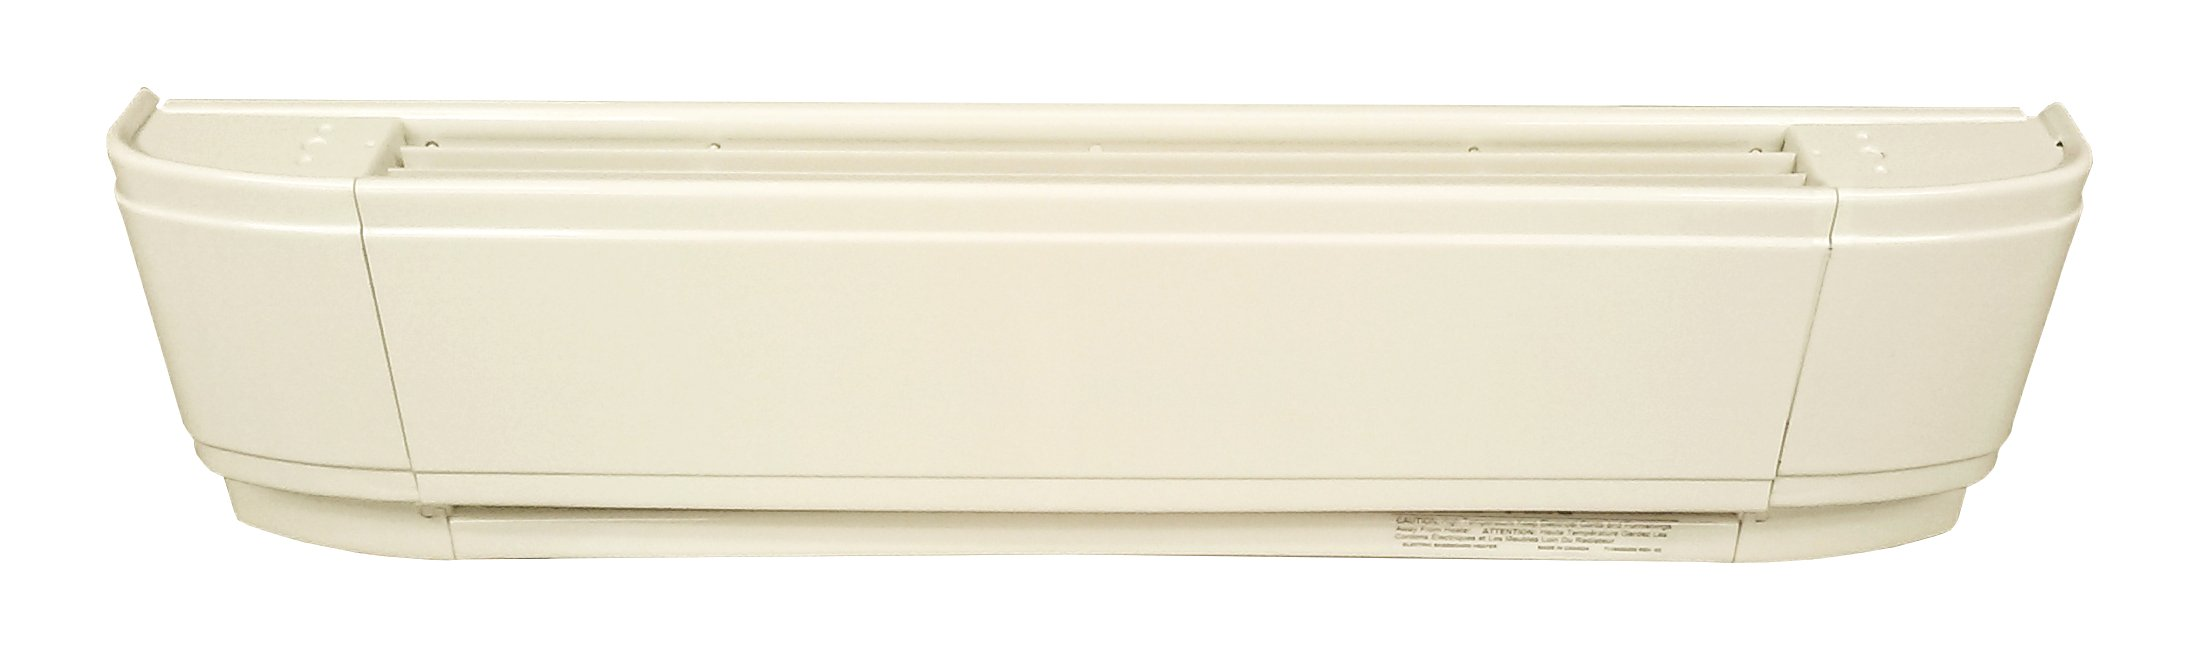 25'' Electric Baseboard Heater, Almond, 500W, 240V